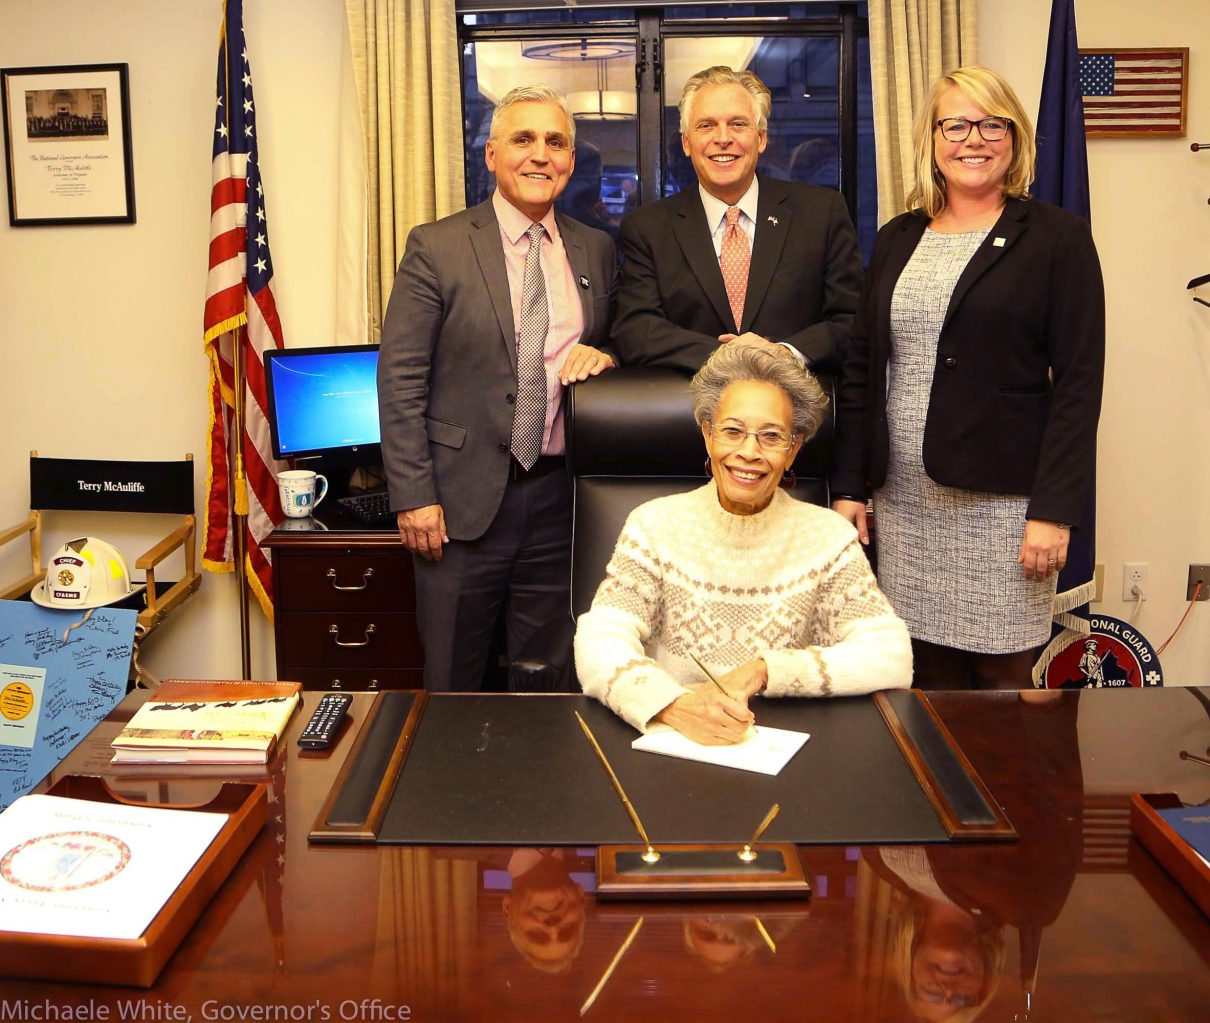 Governor of Virginia Terry McAuliffe